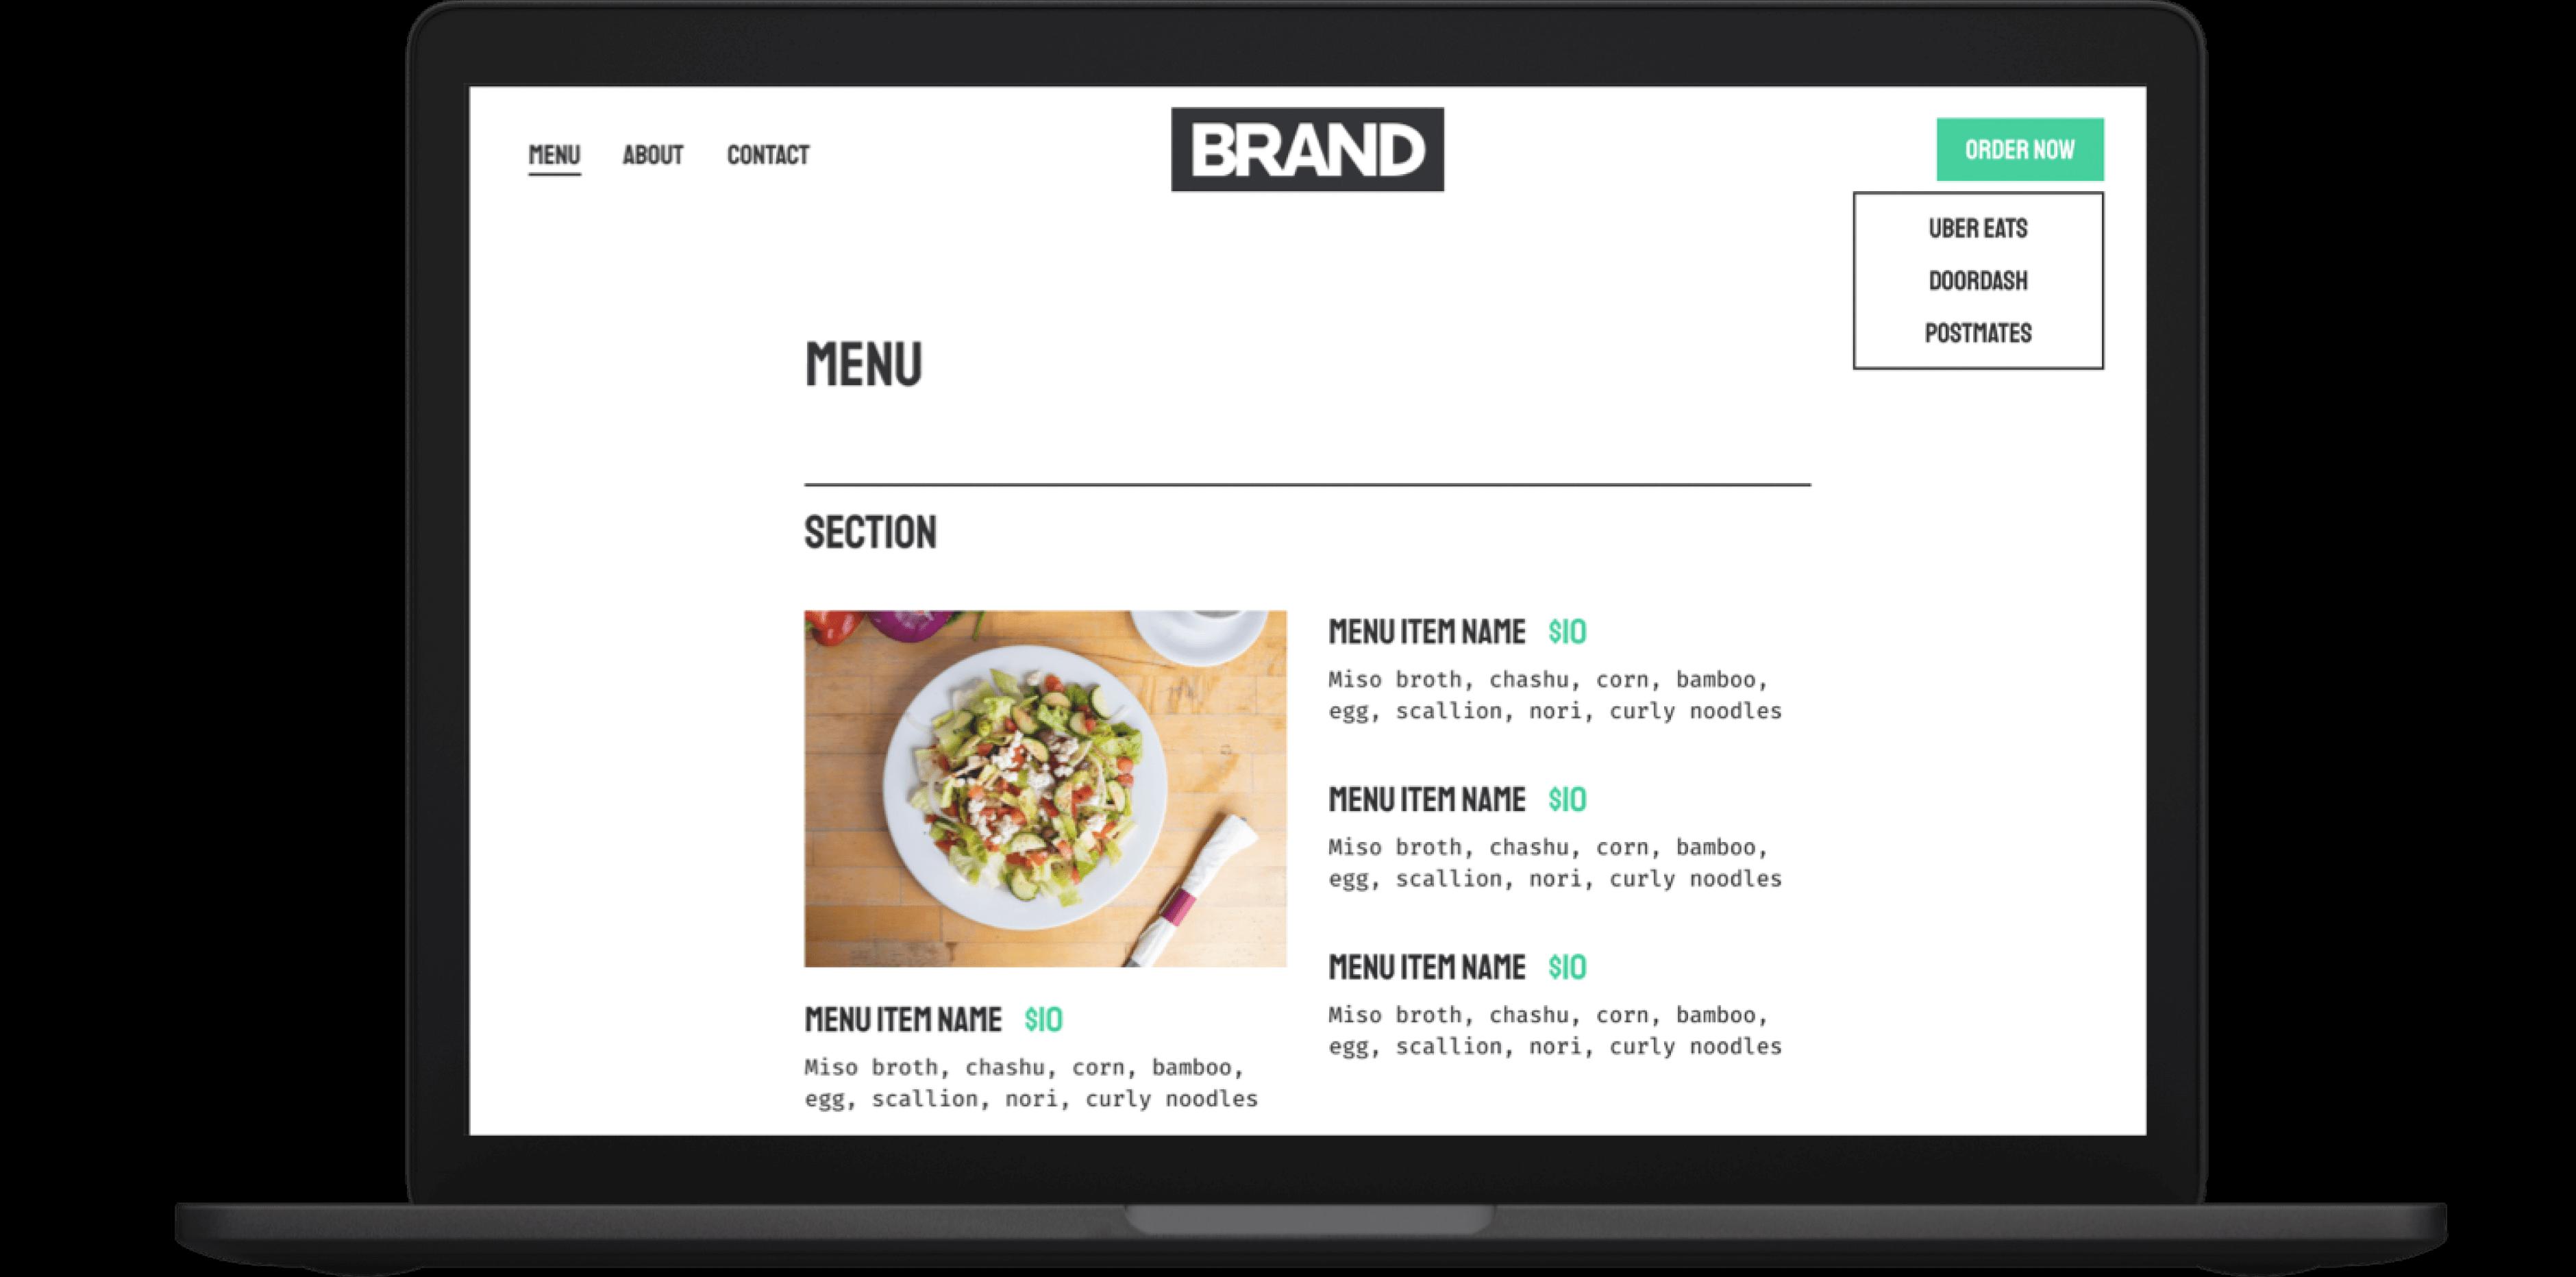 virtual kitchens ordering menu